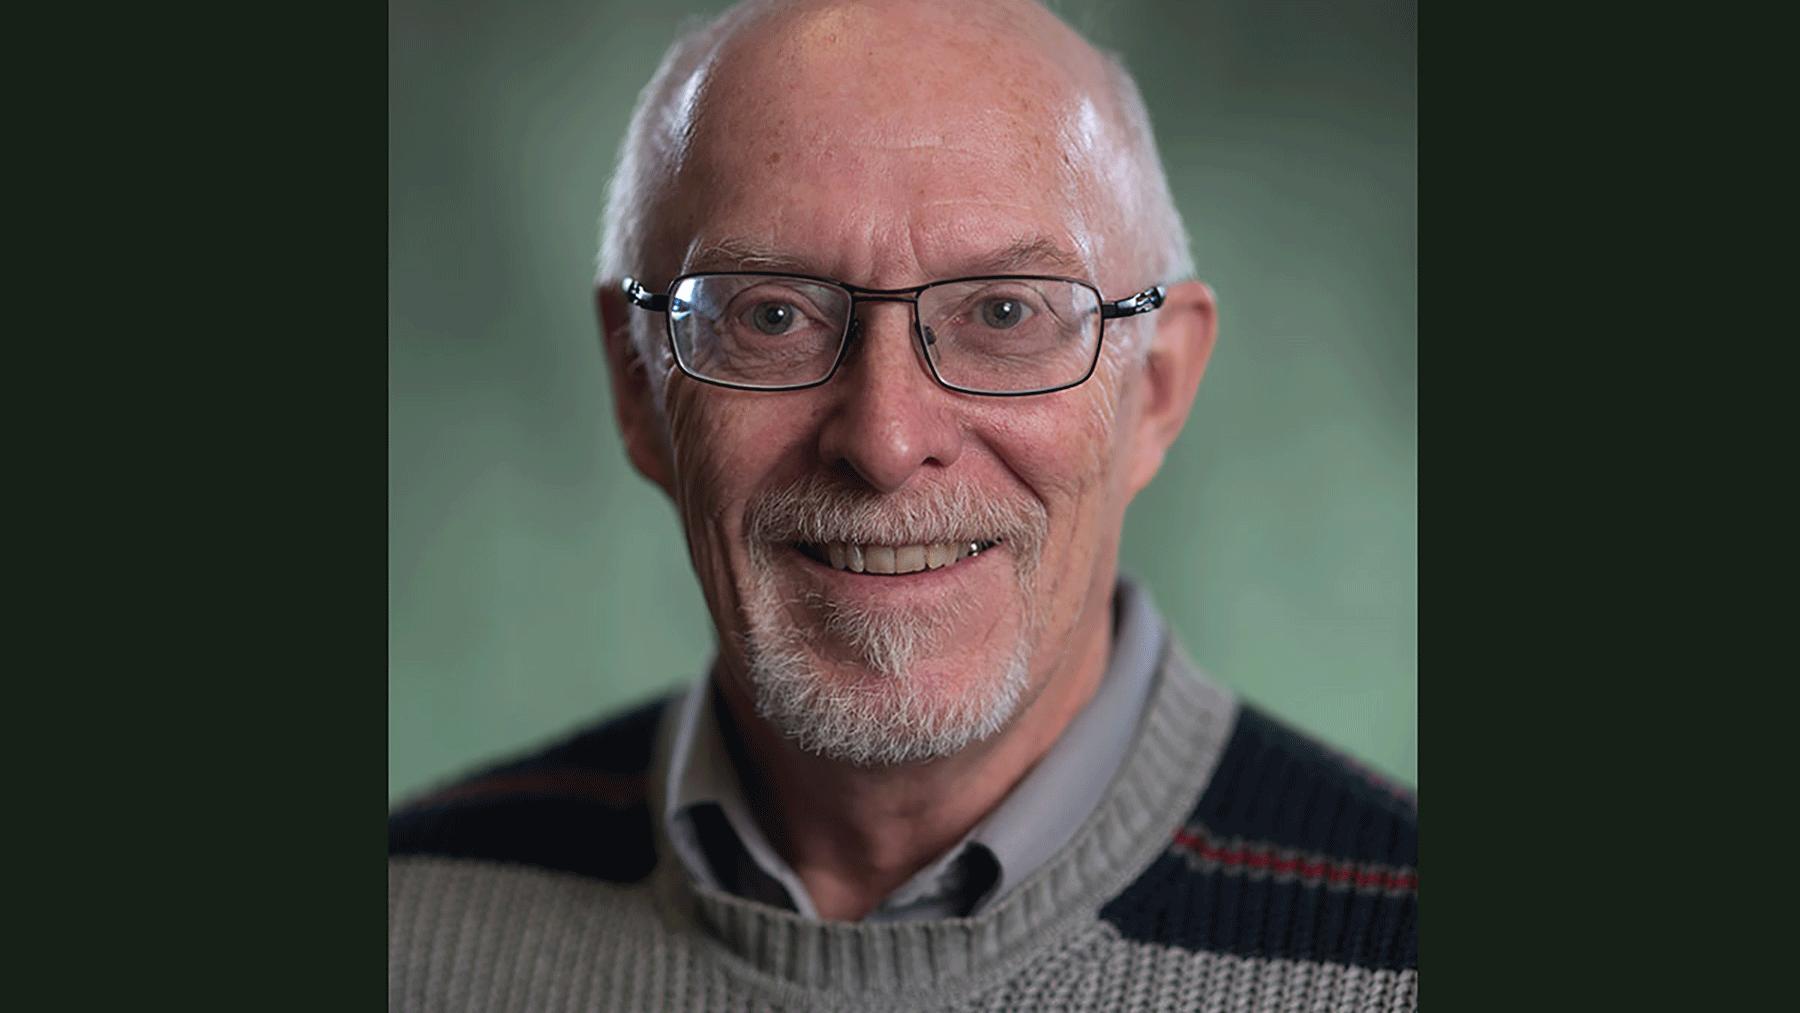 Social work dean Steve Anderson